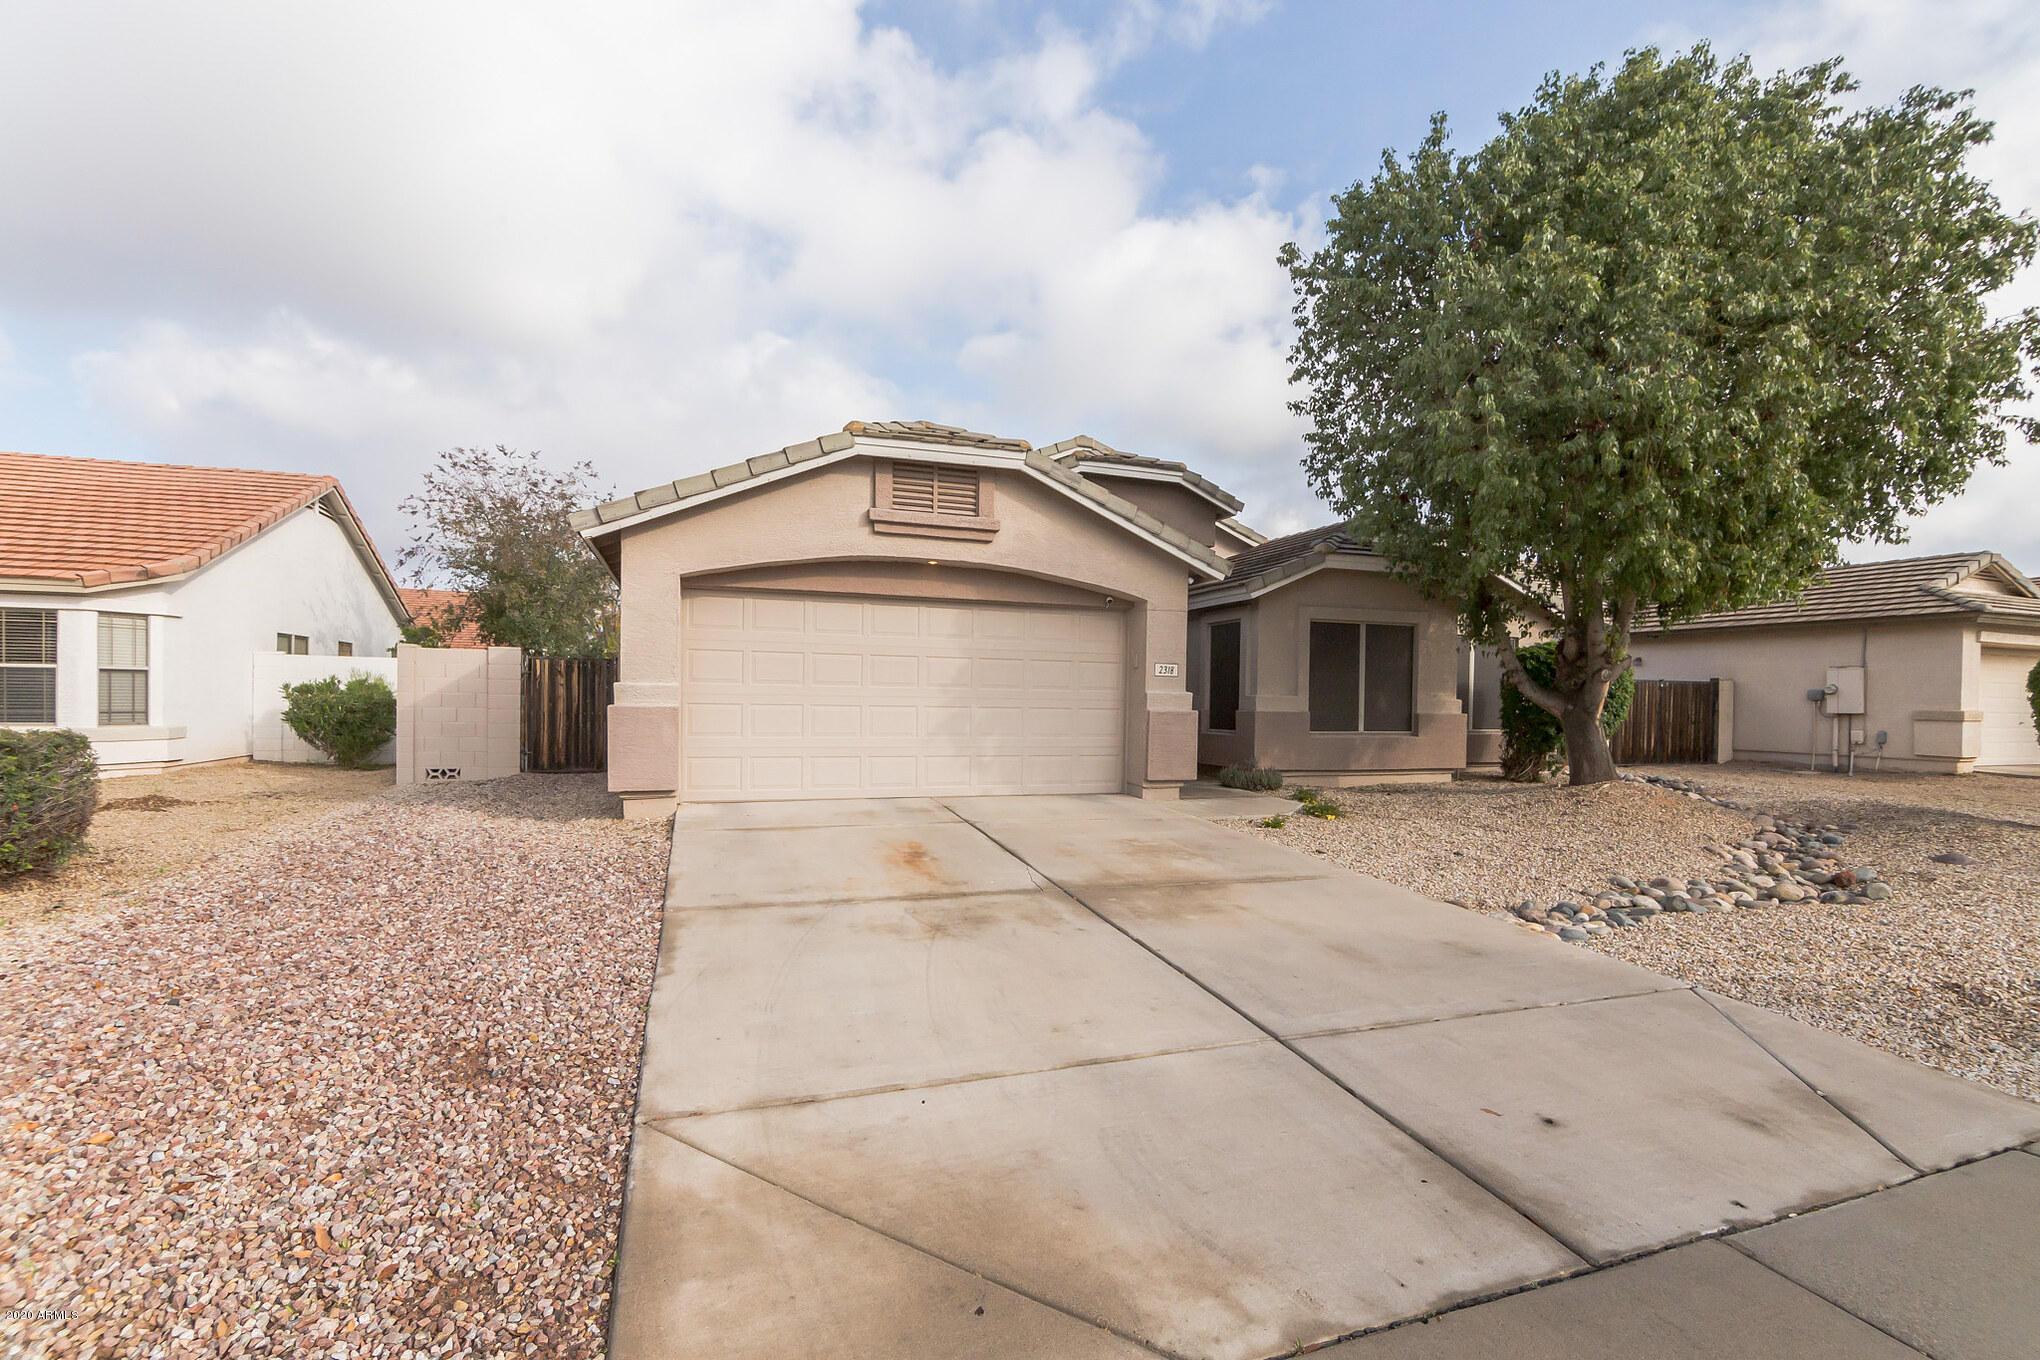 Photo of 2318 E CATCLAW Street, Gilbert, AZ 85296